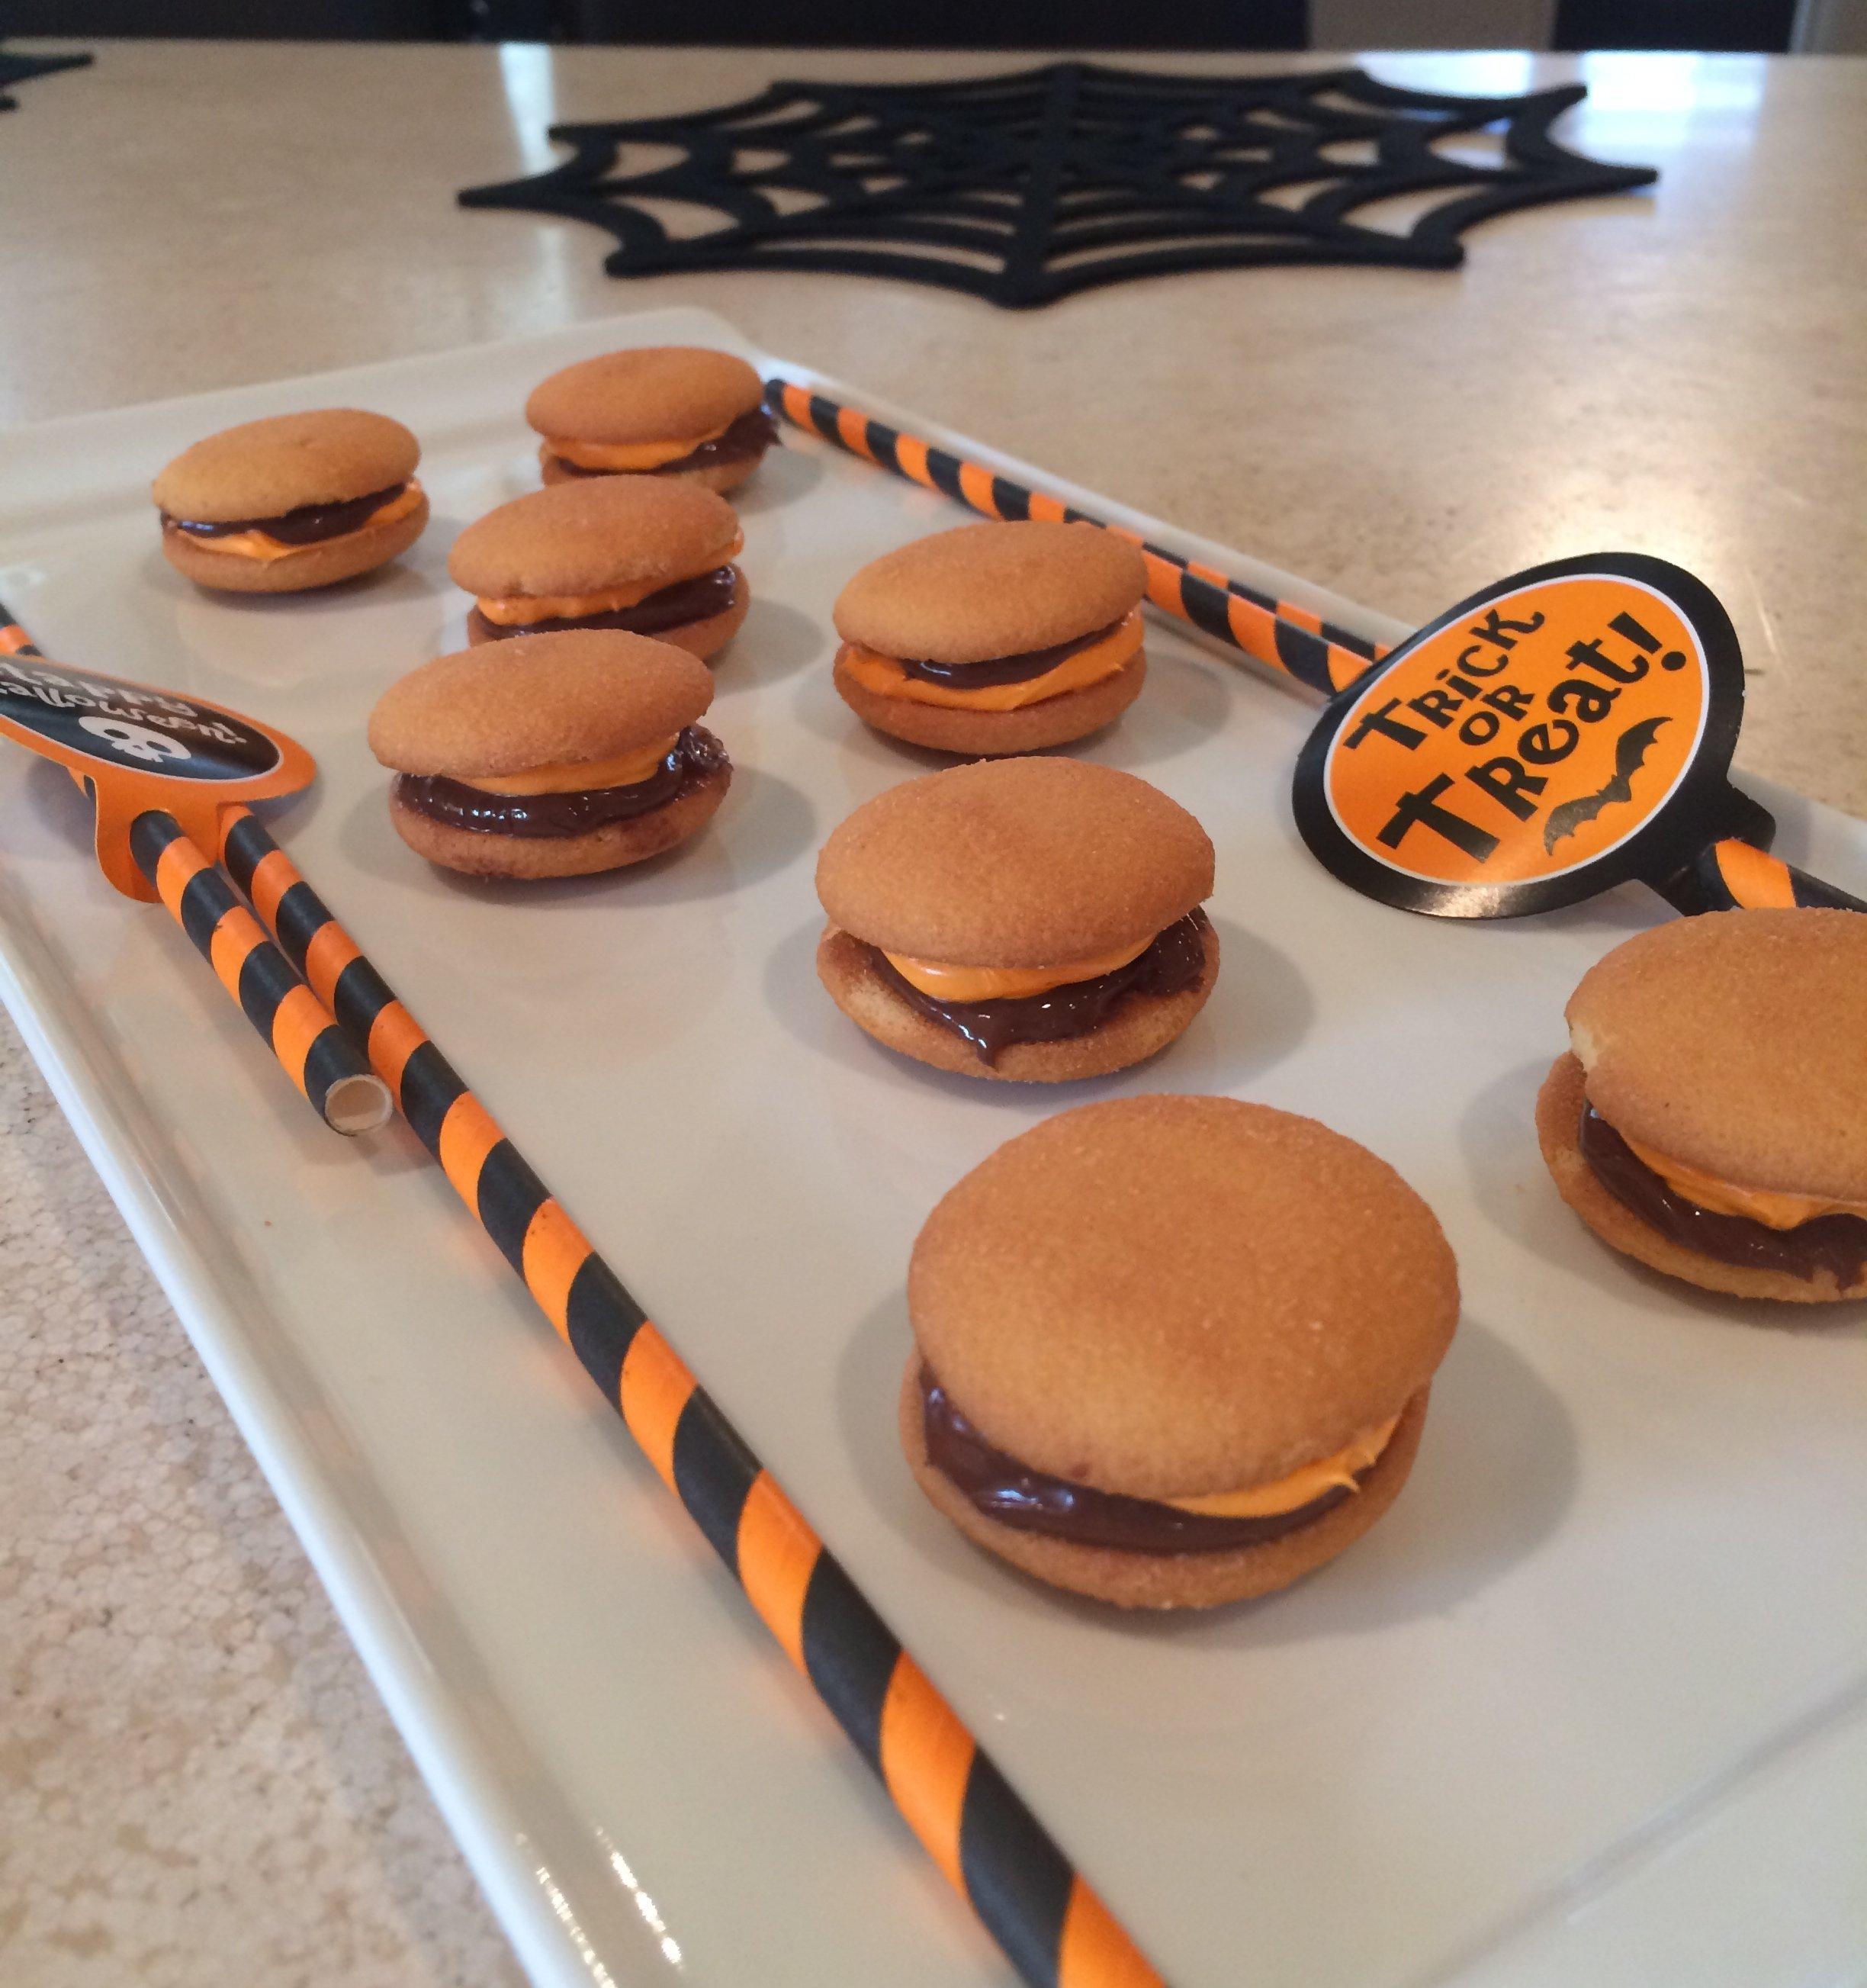 10 Beautiful Halloween Treat Ideas For Kids Party easy halloween party treats for kids 2020